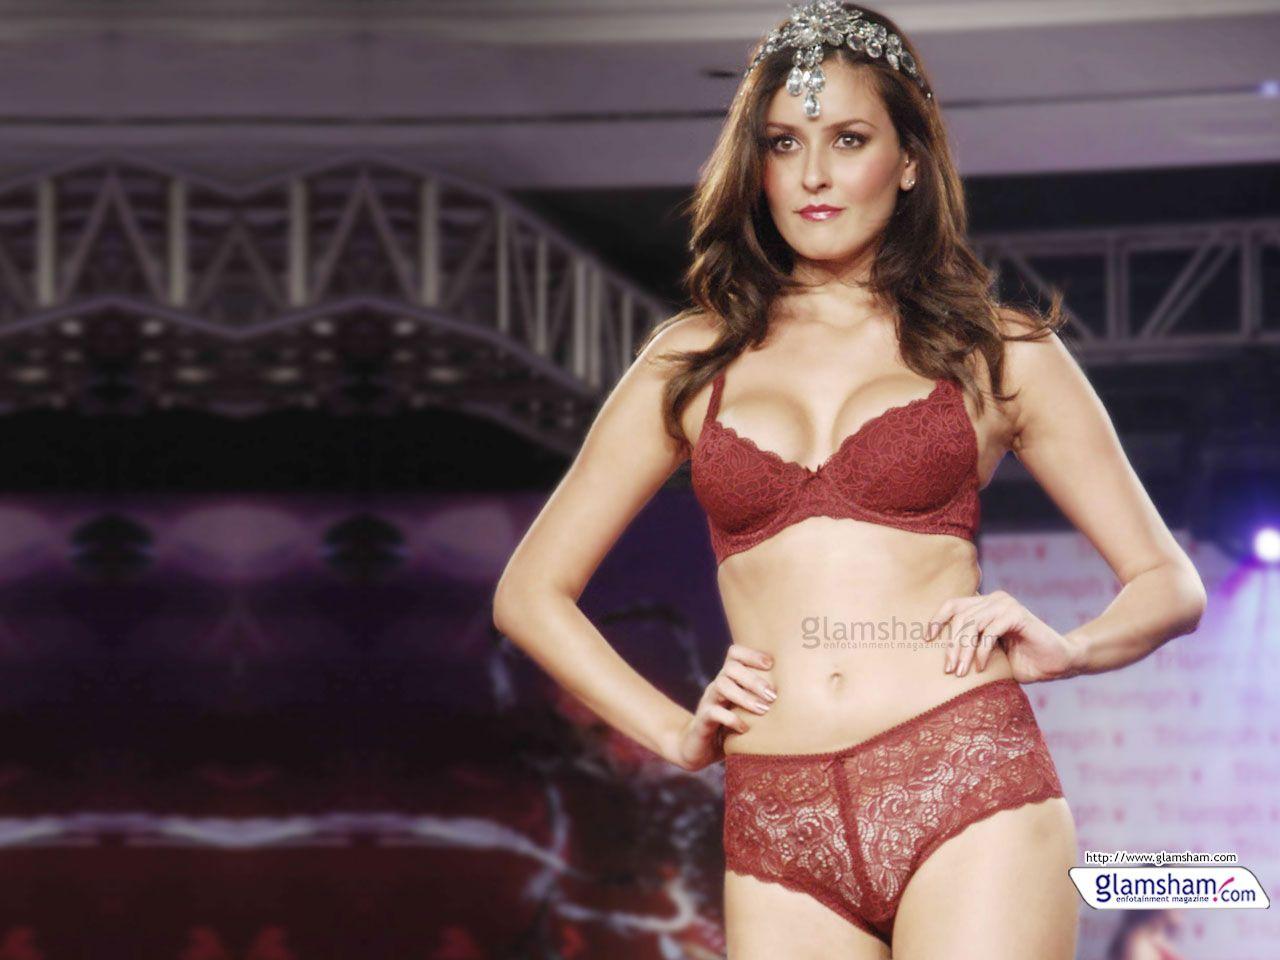 hot indian model female wallpaper glamsham | hd wallpapers